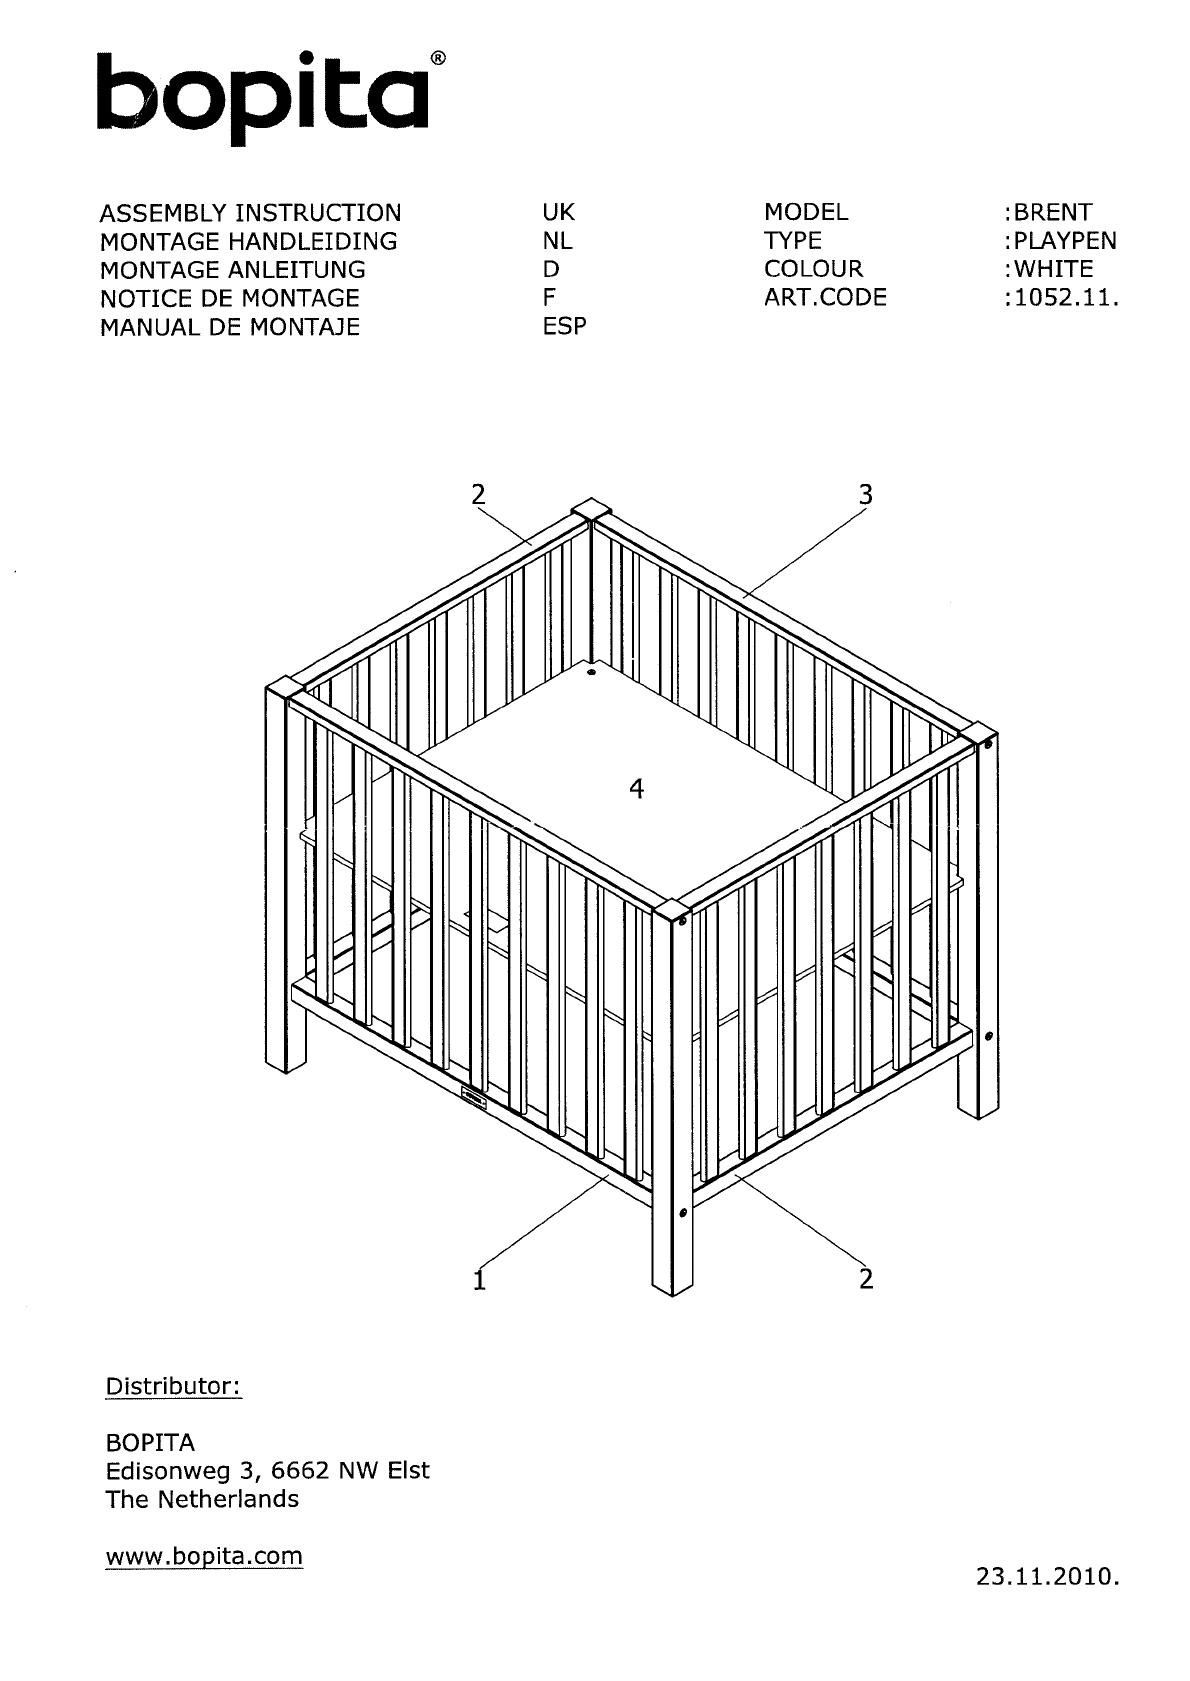 Handleiding Bopita Box Brent Pagina 1 Van 3 Nederlands